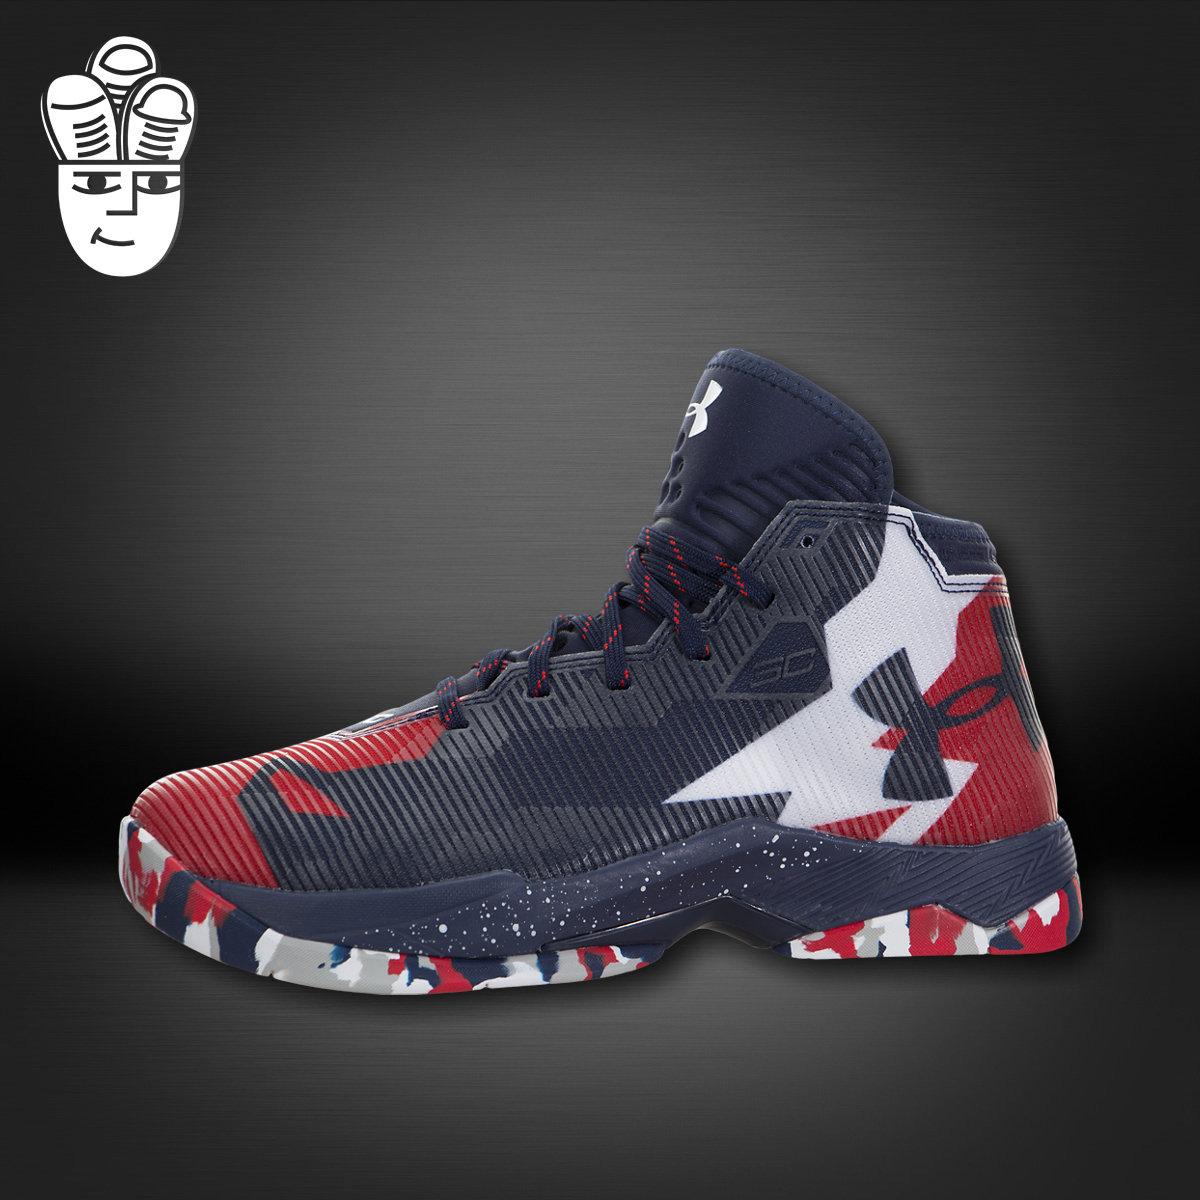 sports shoes b527a 416b6 curry 2.5 shoes price korea